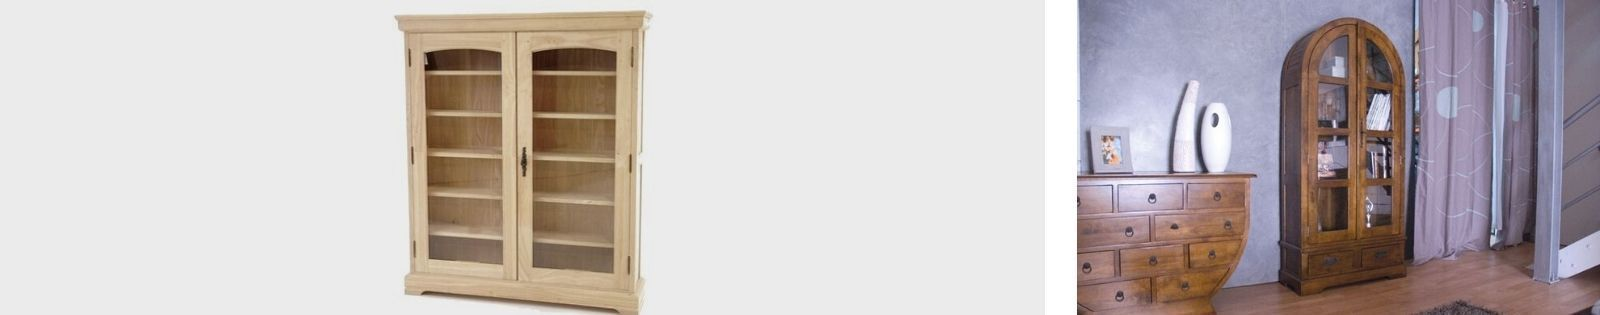 Vitrine en bois massif : chêne, hevea, acacia, teck, bambou, rotin. Meubles de salle à manger